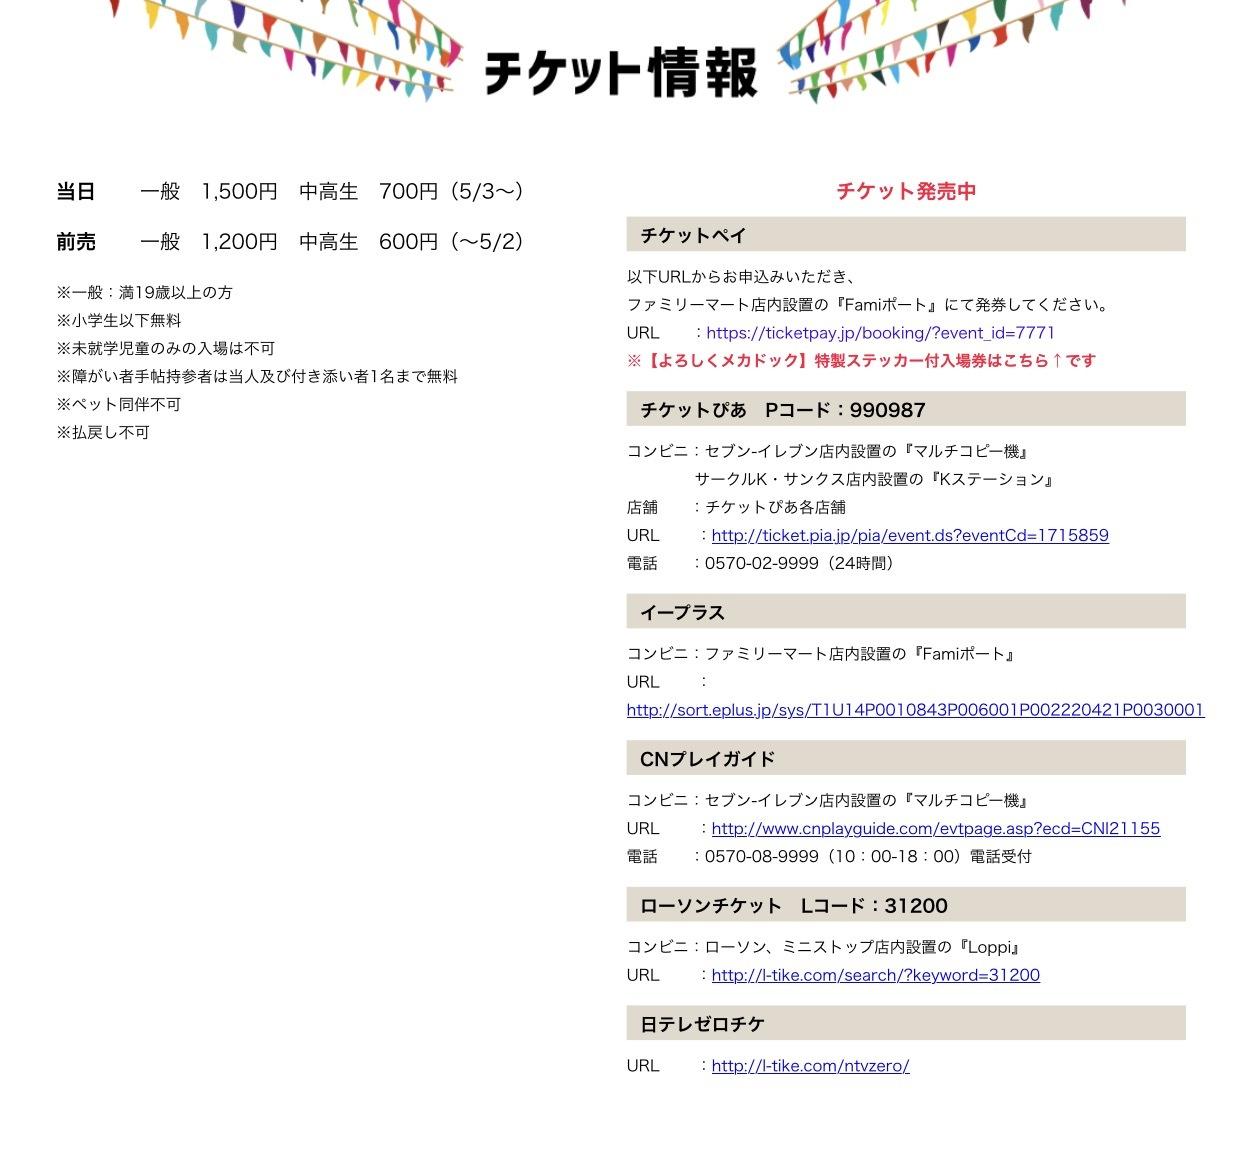 GO! GO! 5月!!  〜ライブスケジュール〜_f0115311_02344009.png